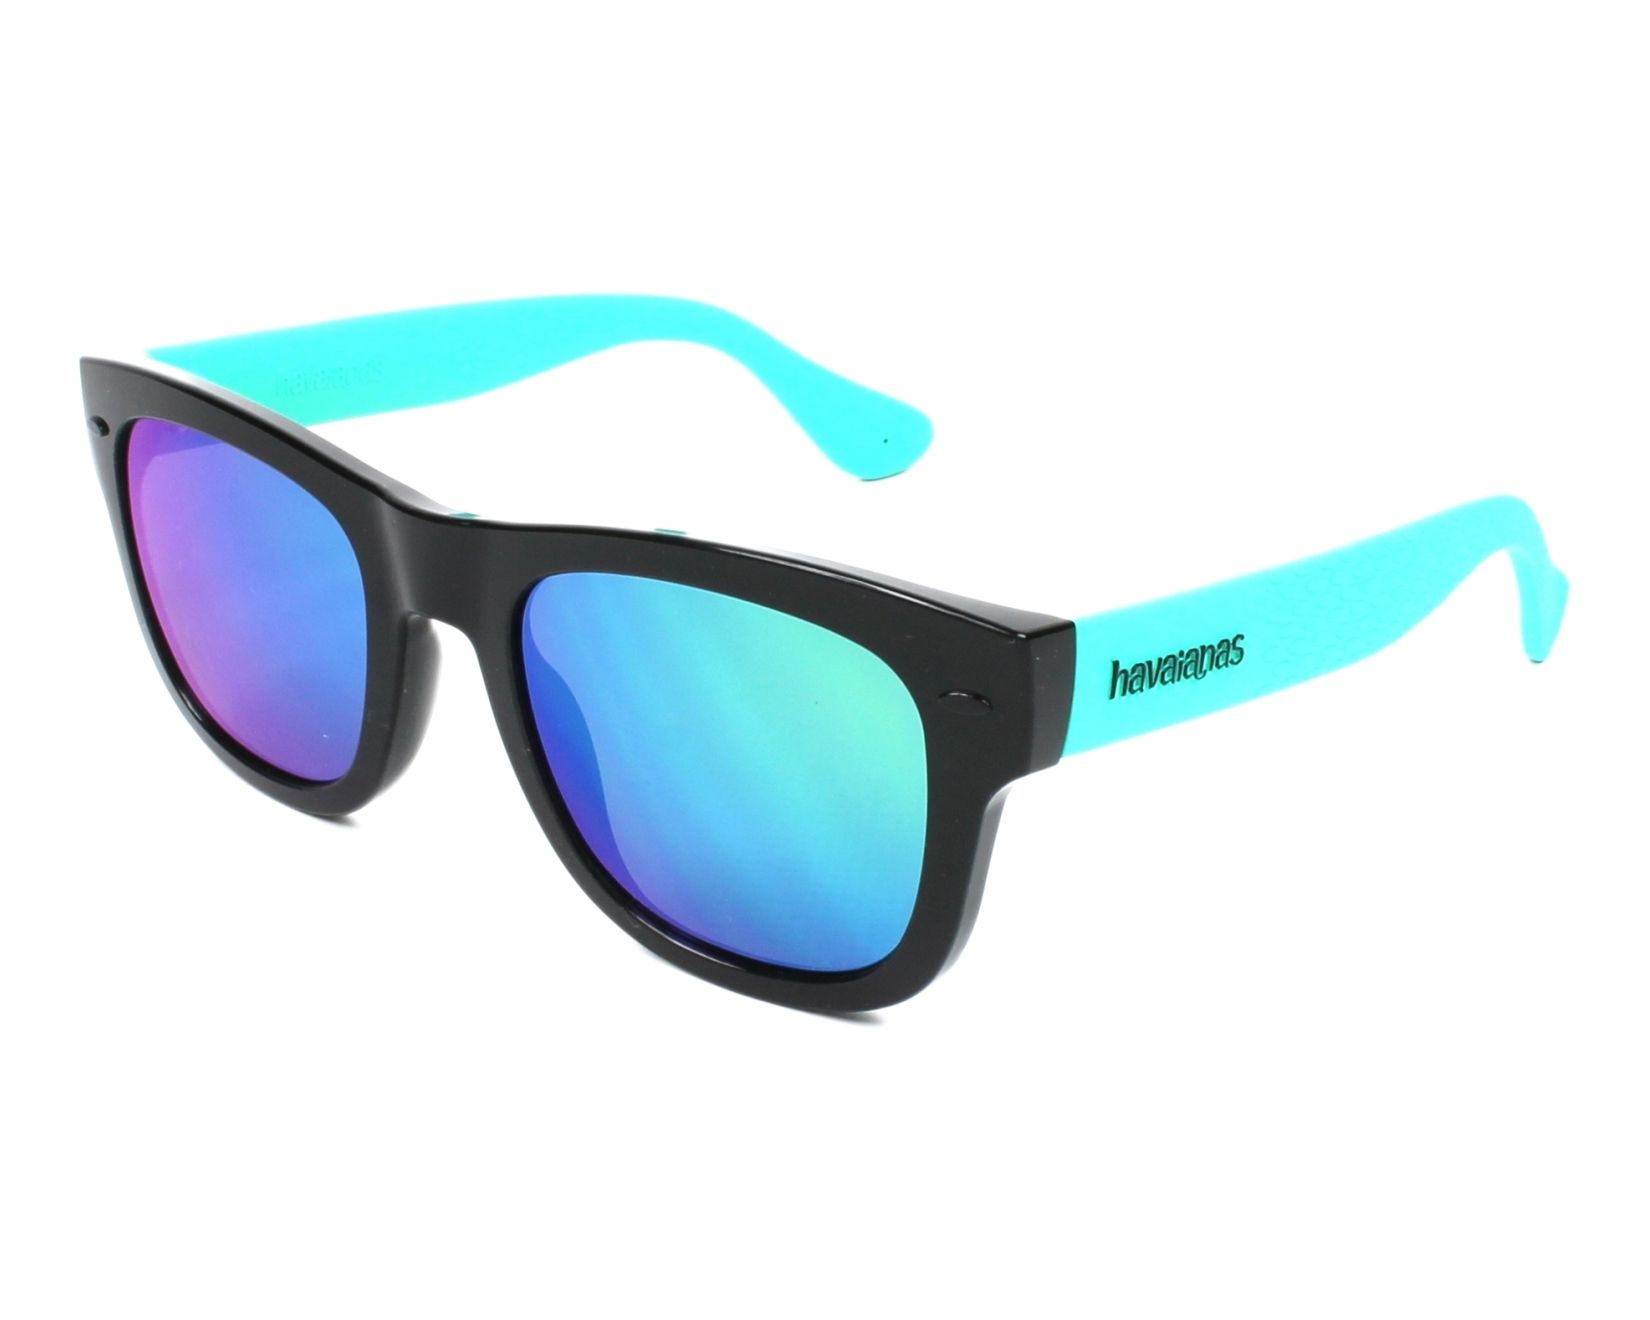 Havaianas Sonnenbrille » PARATY/S«, lila, QPV/Y1 - lila/grau